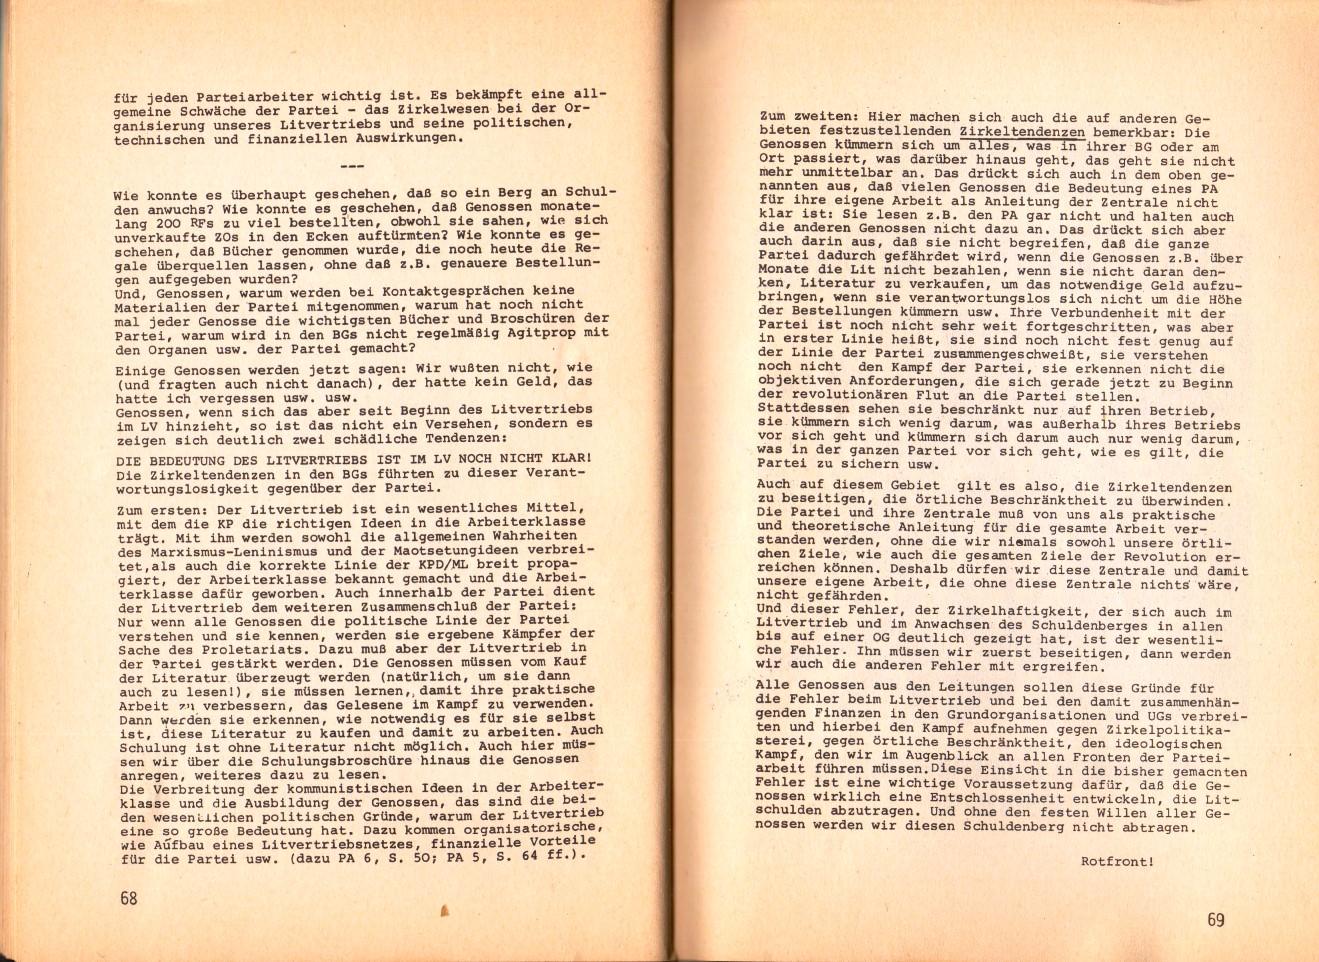 ZB_Parteiarbeiter_1971_10_36